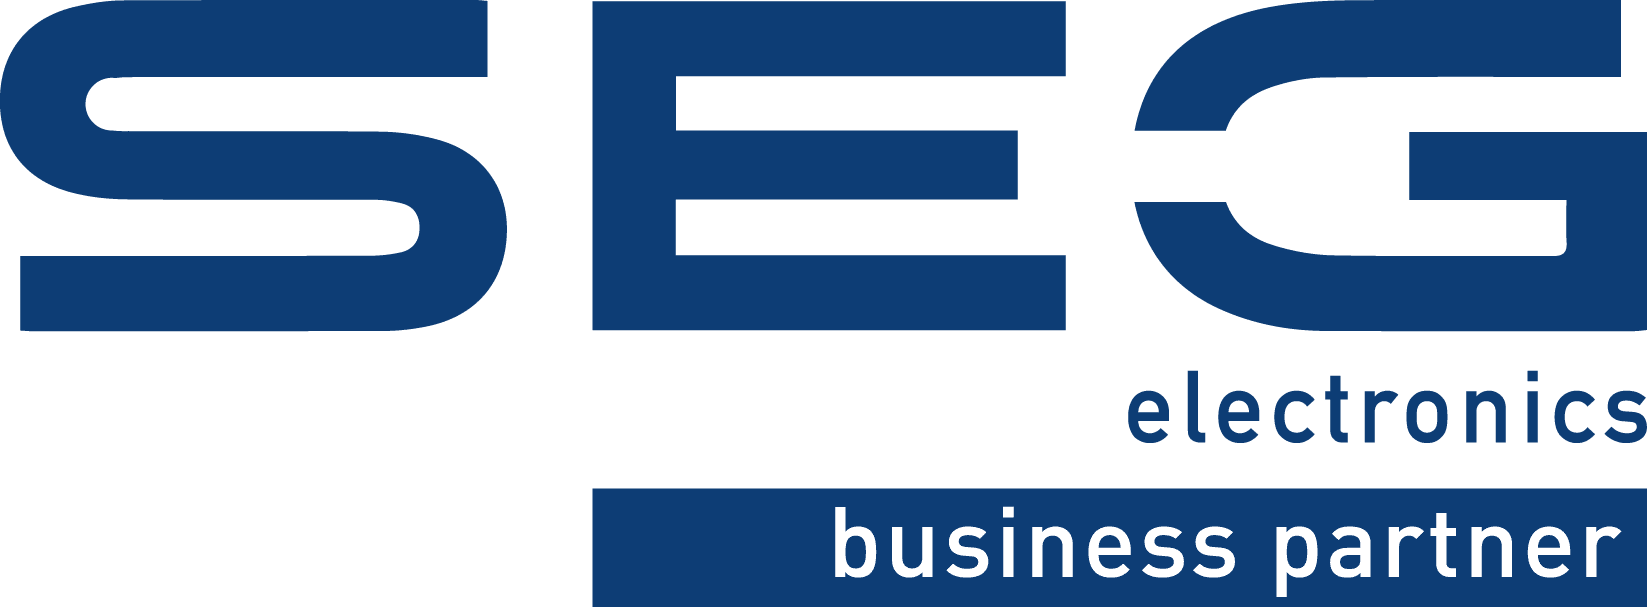 SEG Electronics Business Partner Peaker Services